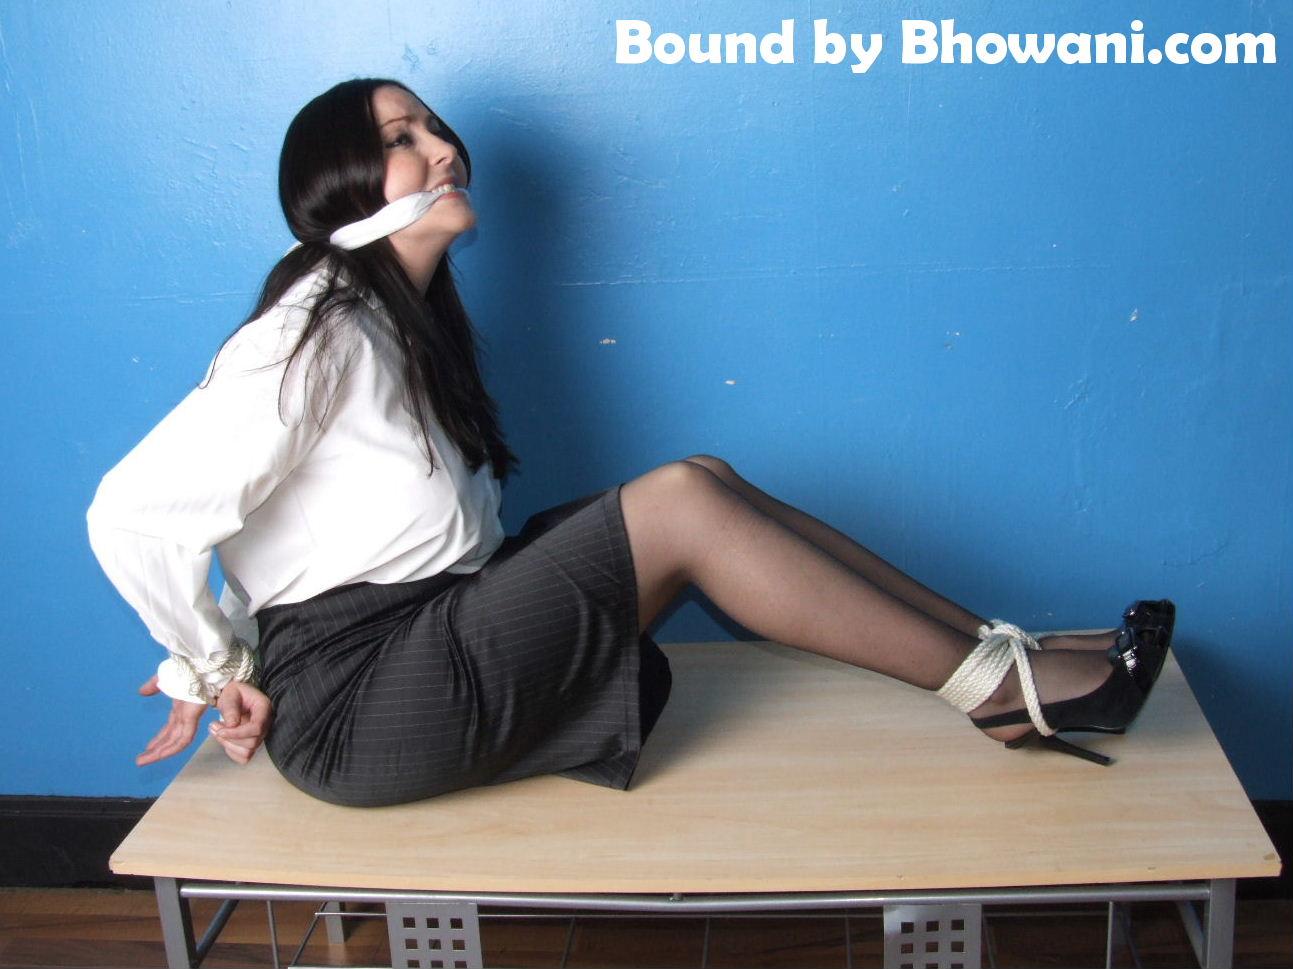 Bhowani